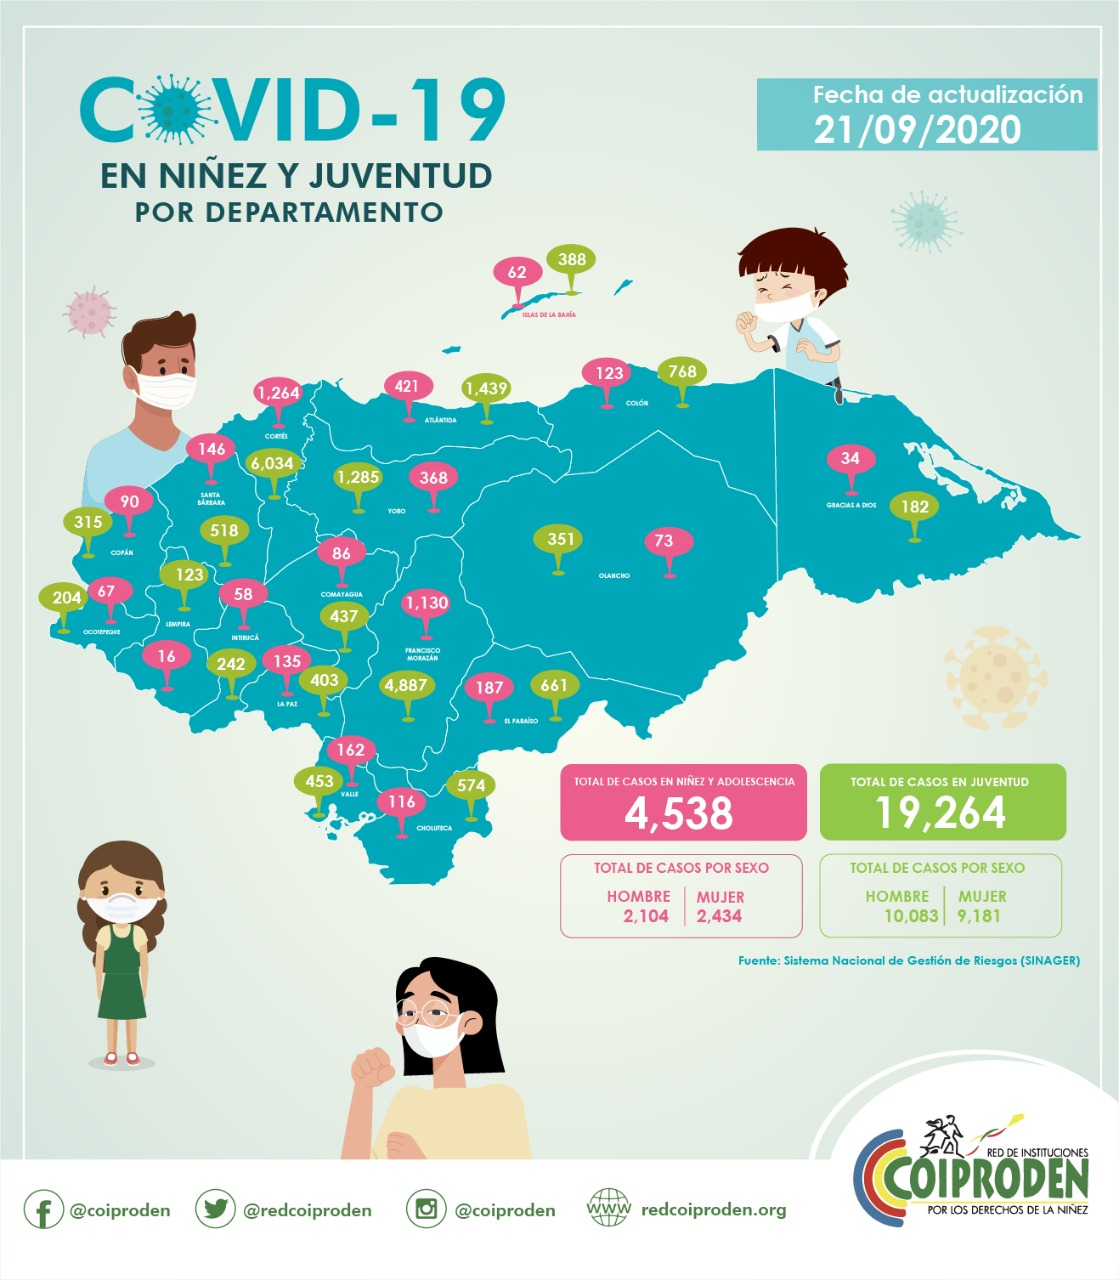 4,538 niños se infectaron de COVID-19 en Honduras en lo que va de pandemia